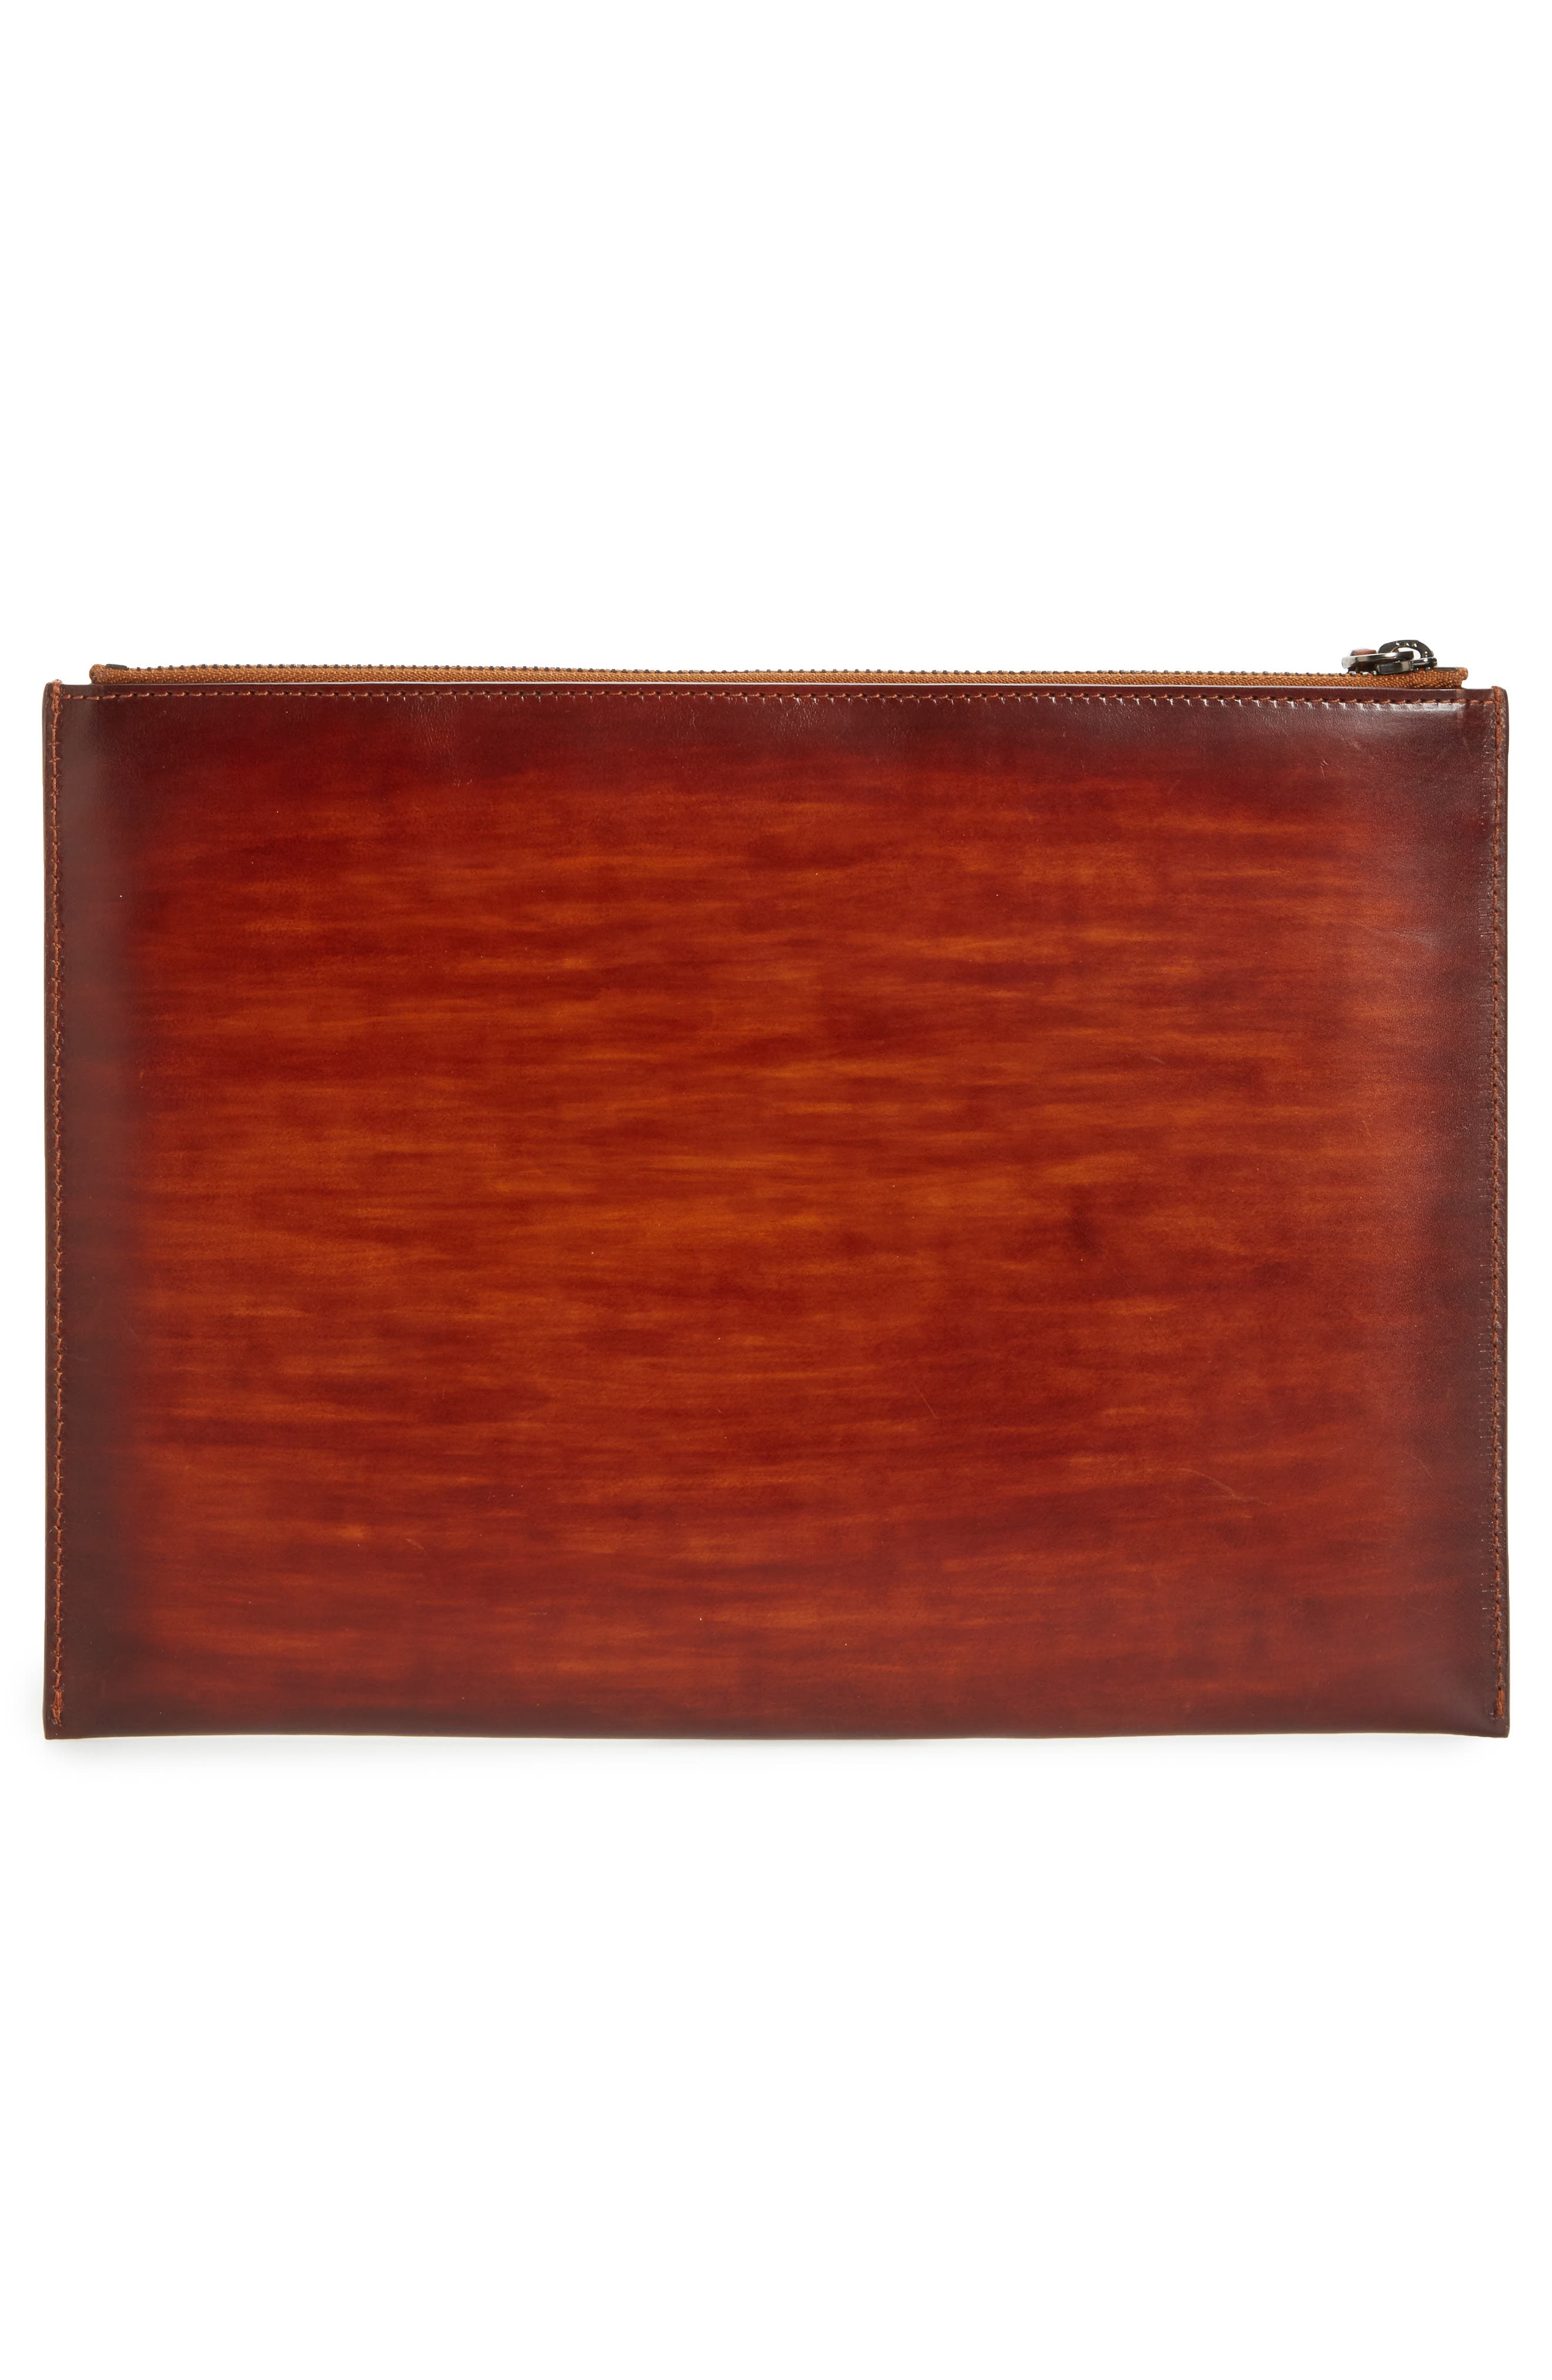 Leather Tablet Case,                             Alternate thumbnail 6, color,